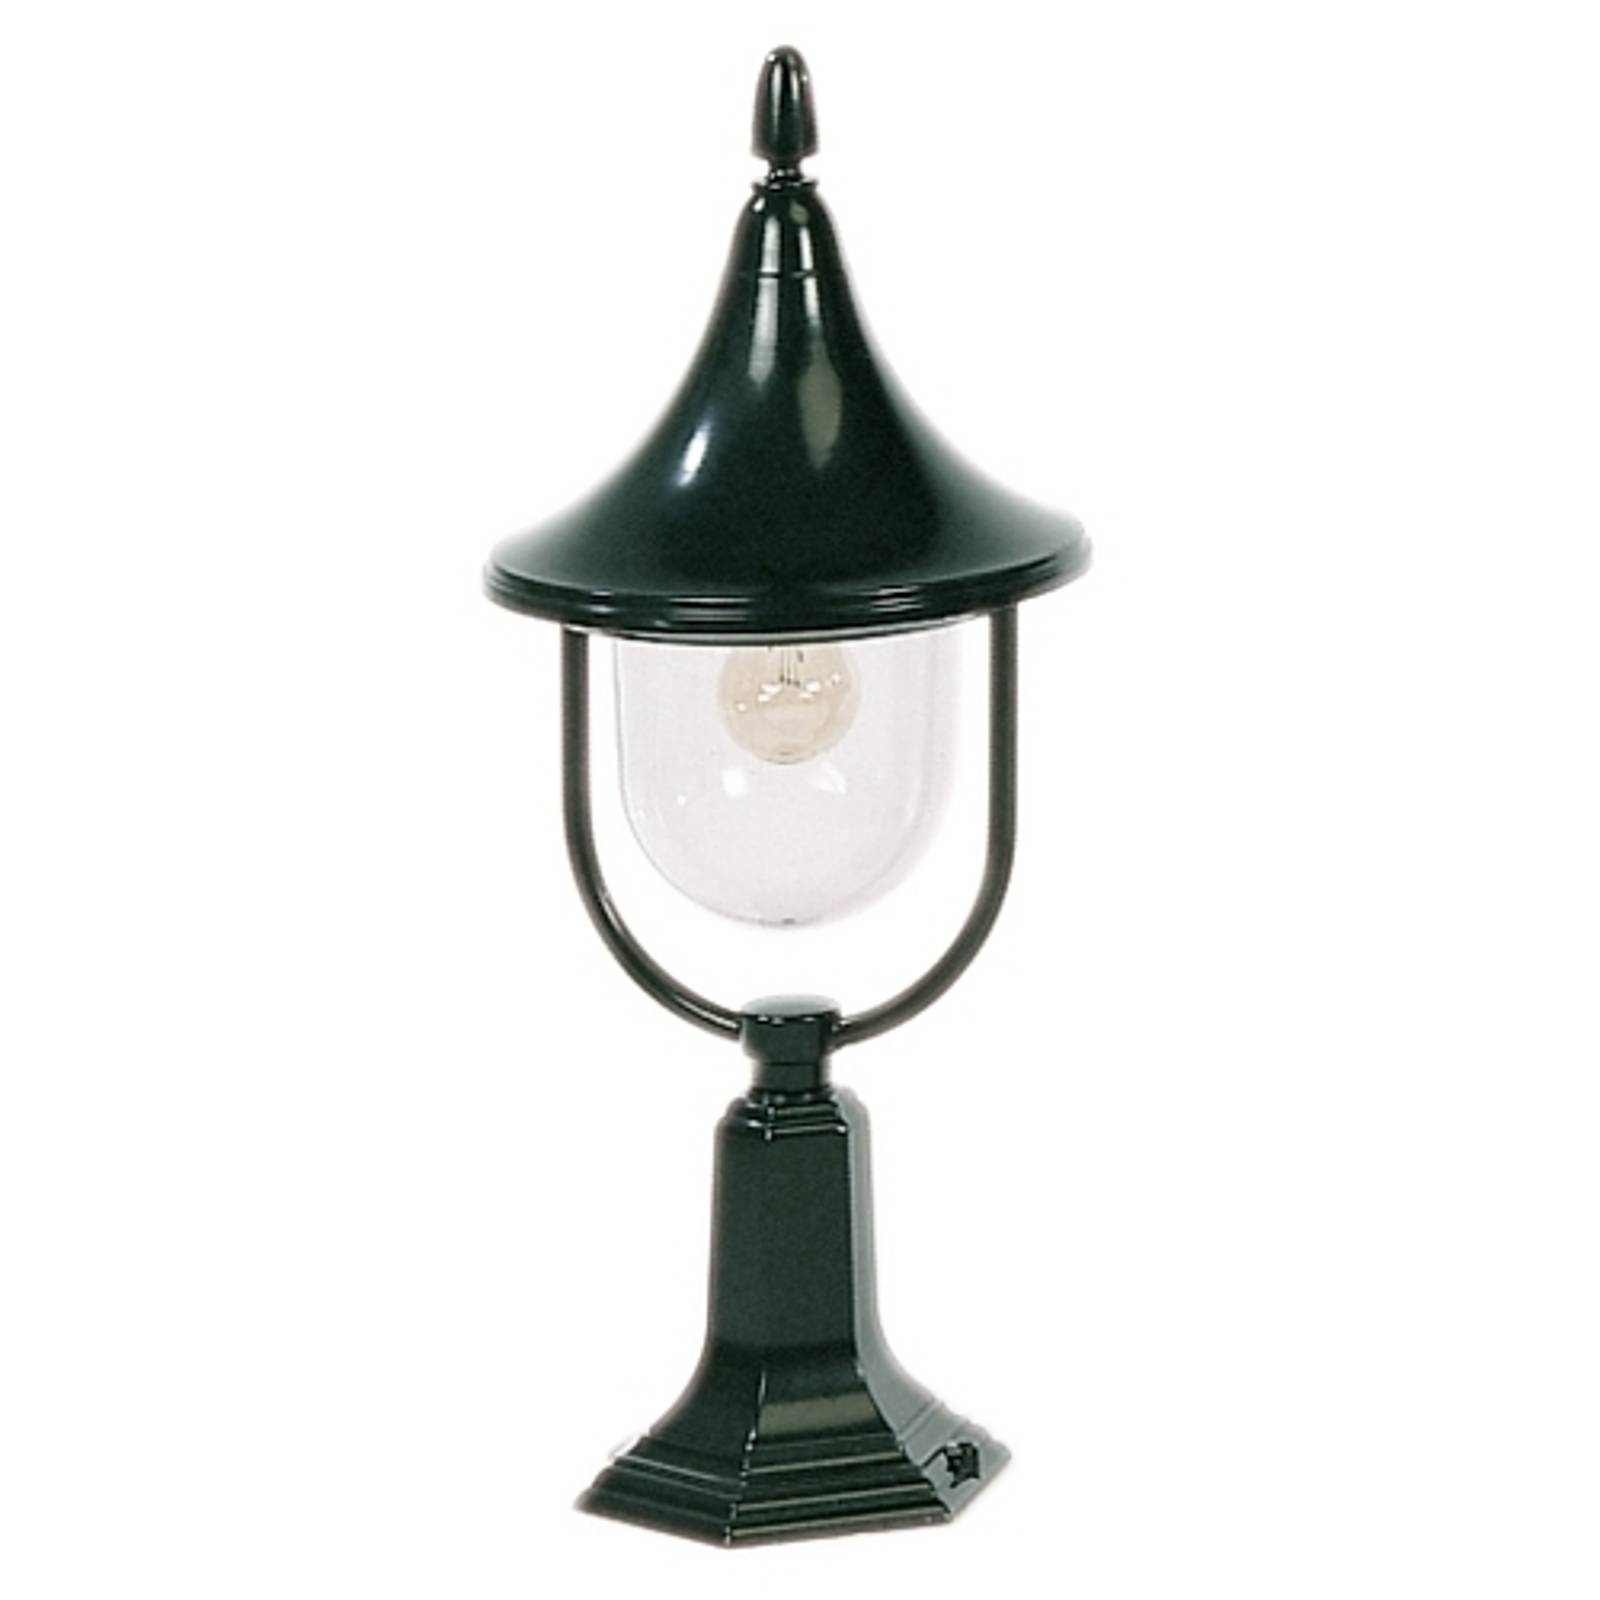 Charmante tuinpadverlichting Venetie, groen